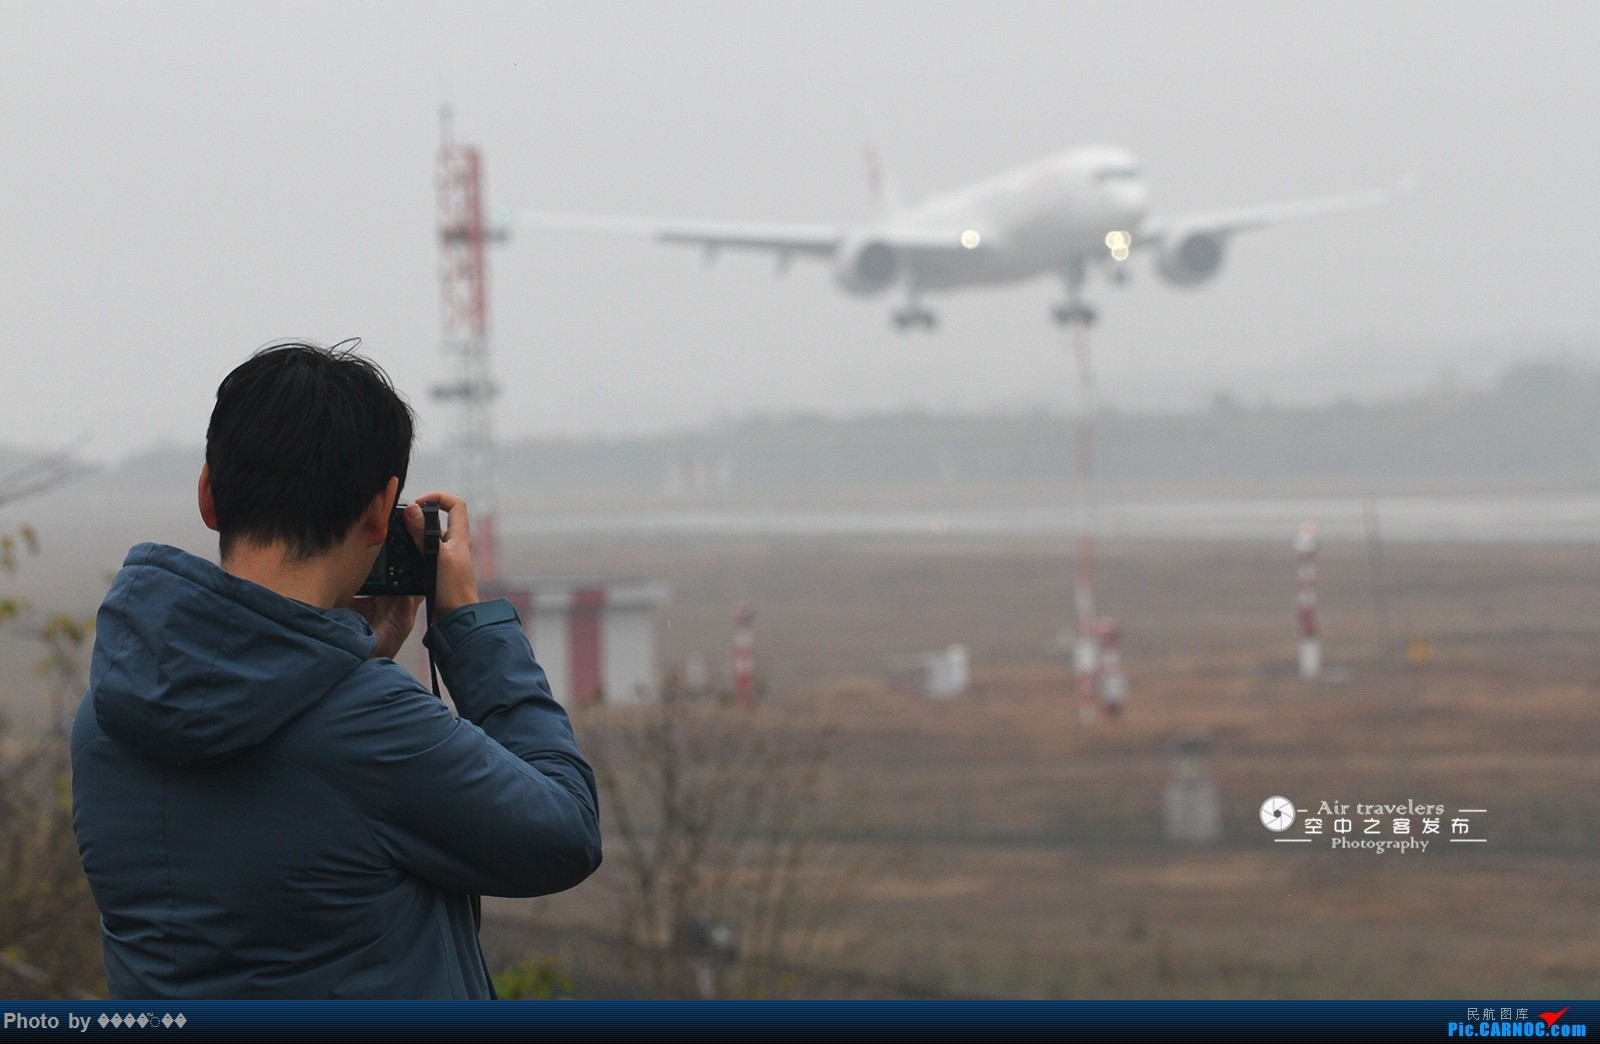 Re:[原创][霸都打机队 空中之客发布]桥机场的高级灰:东航第一架空客A359 B-304D本训... AIRBUS A350-900 B-304D 合肥新桥国际机场